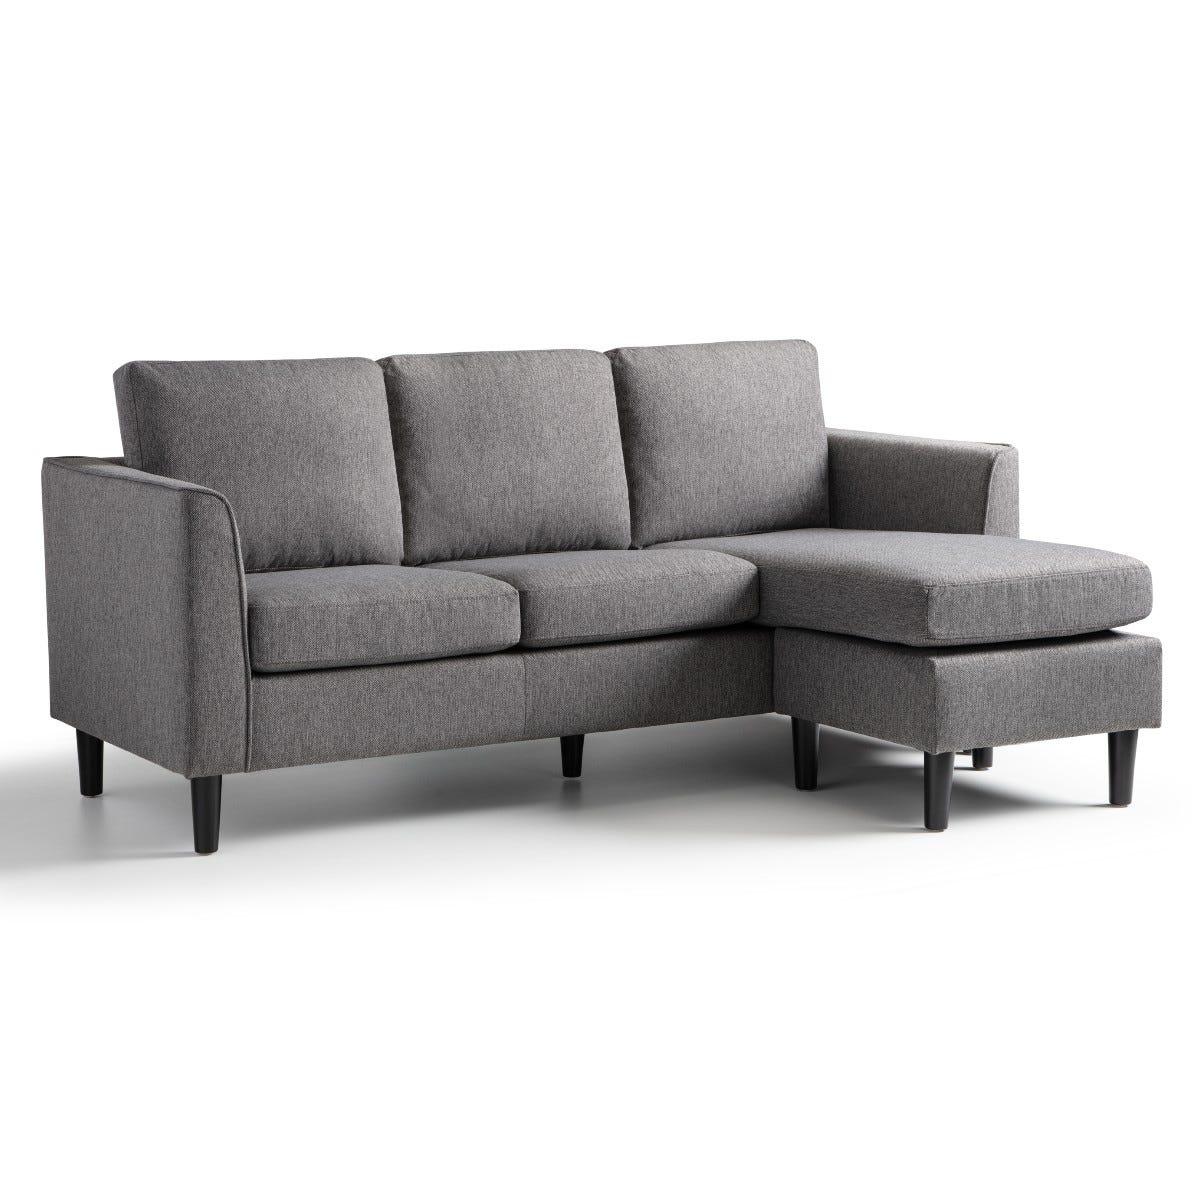 Kara Corner Chaise Sofa Tweed Grey